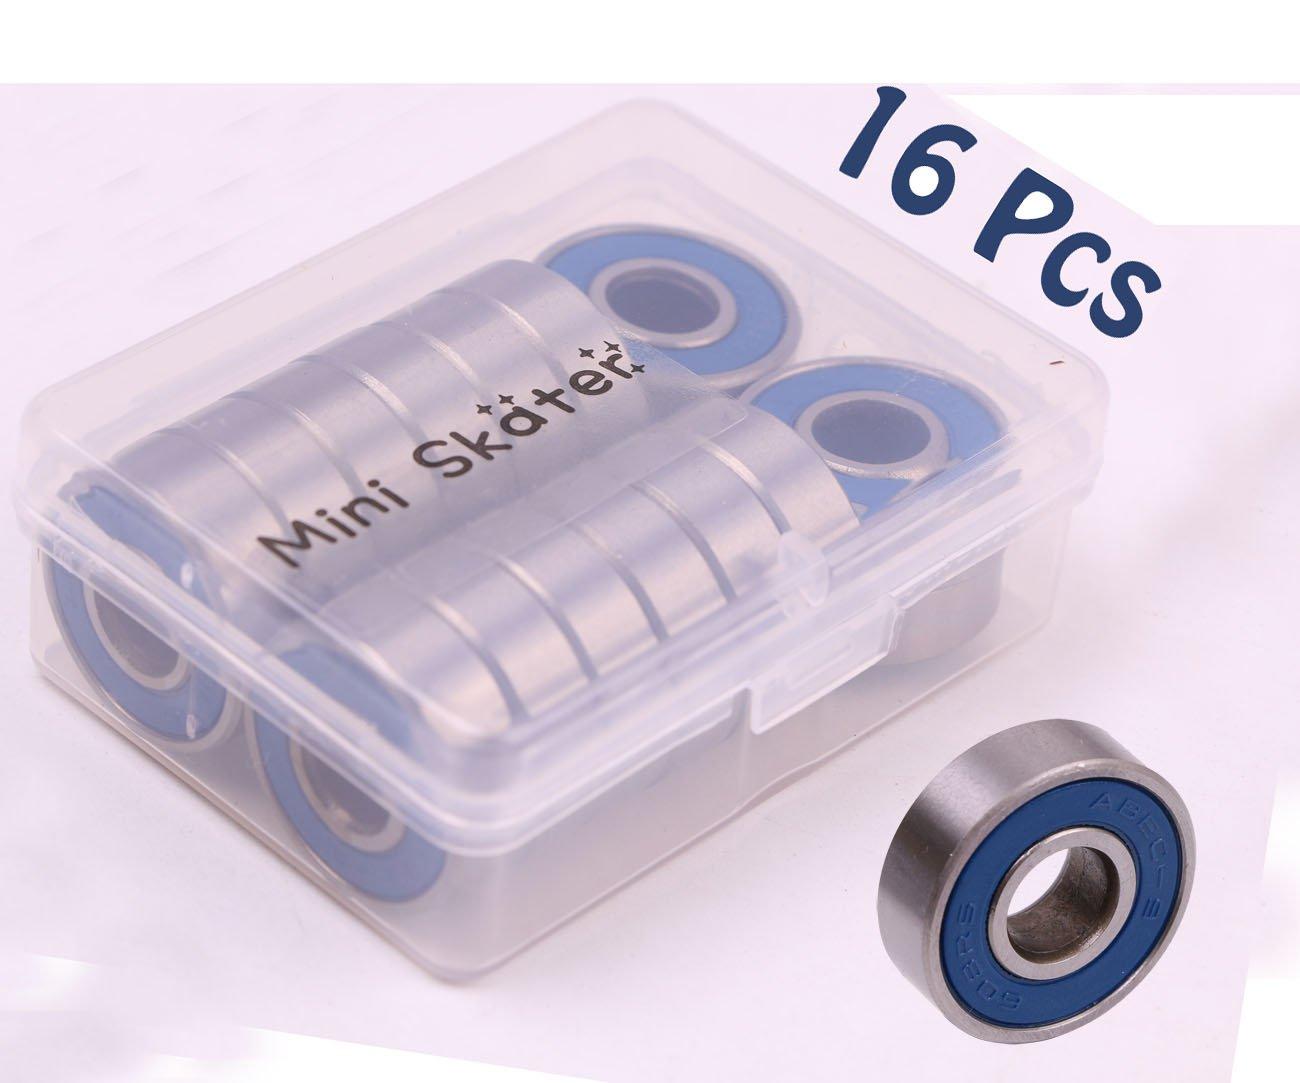 16 PCS Black Generic ABEC 9 Precision 608 RS Skate Ball Bearing Deck